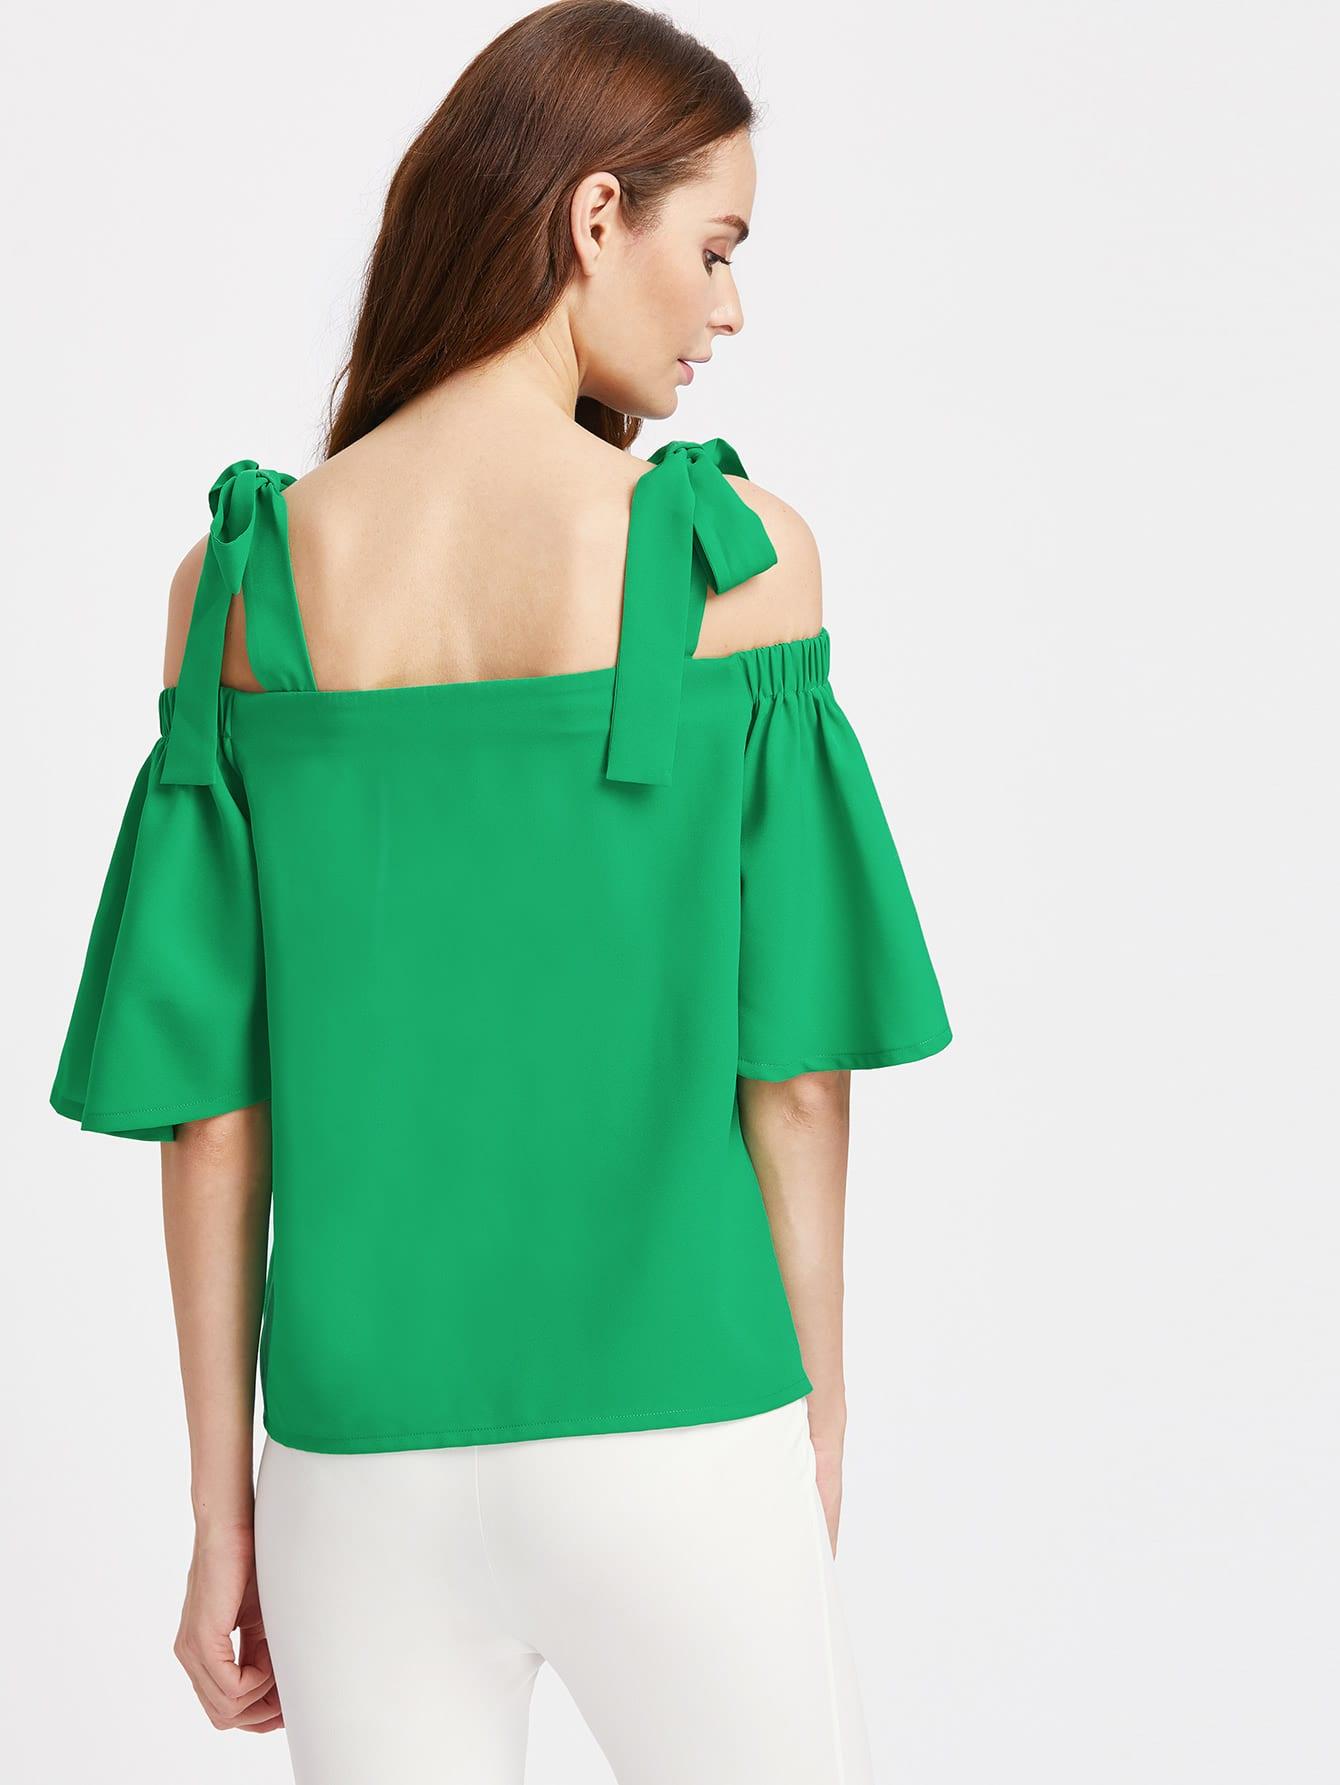 blouse170424706_2